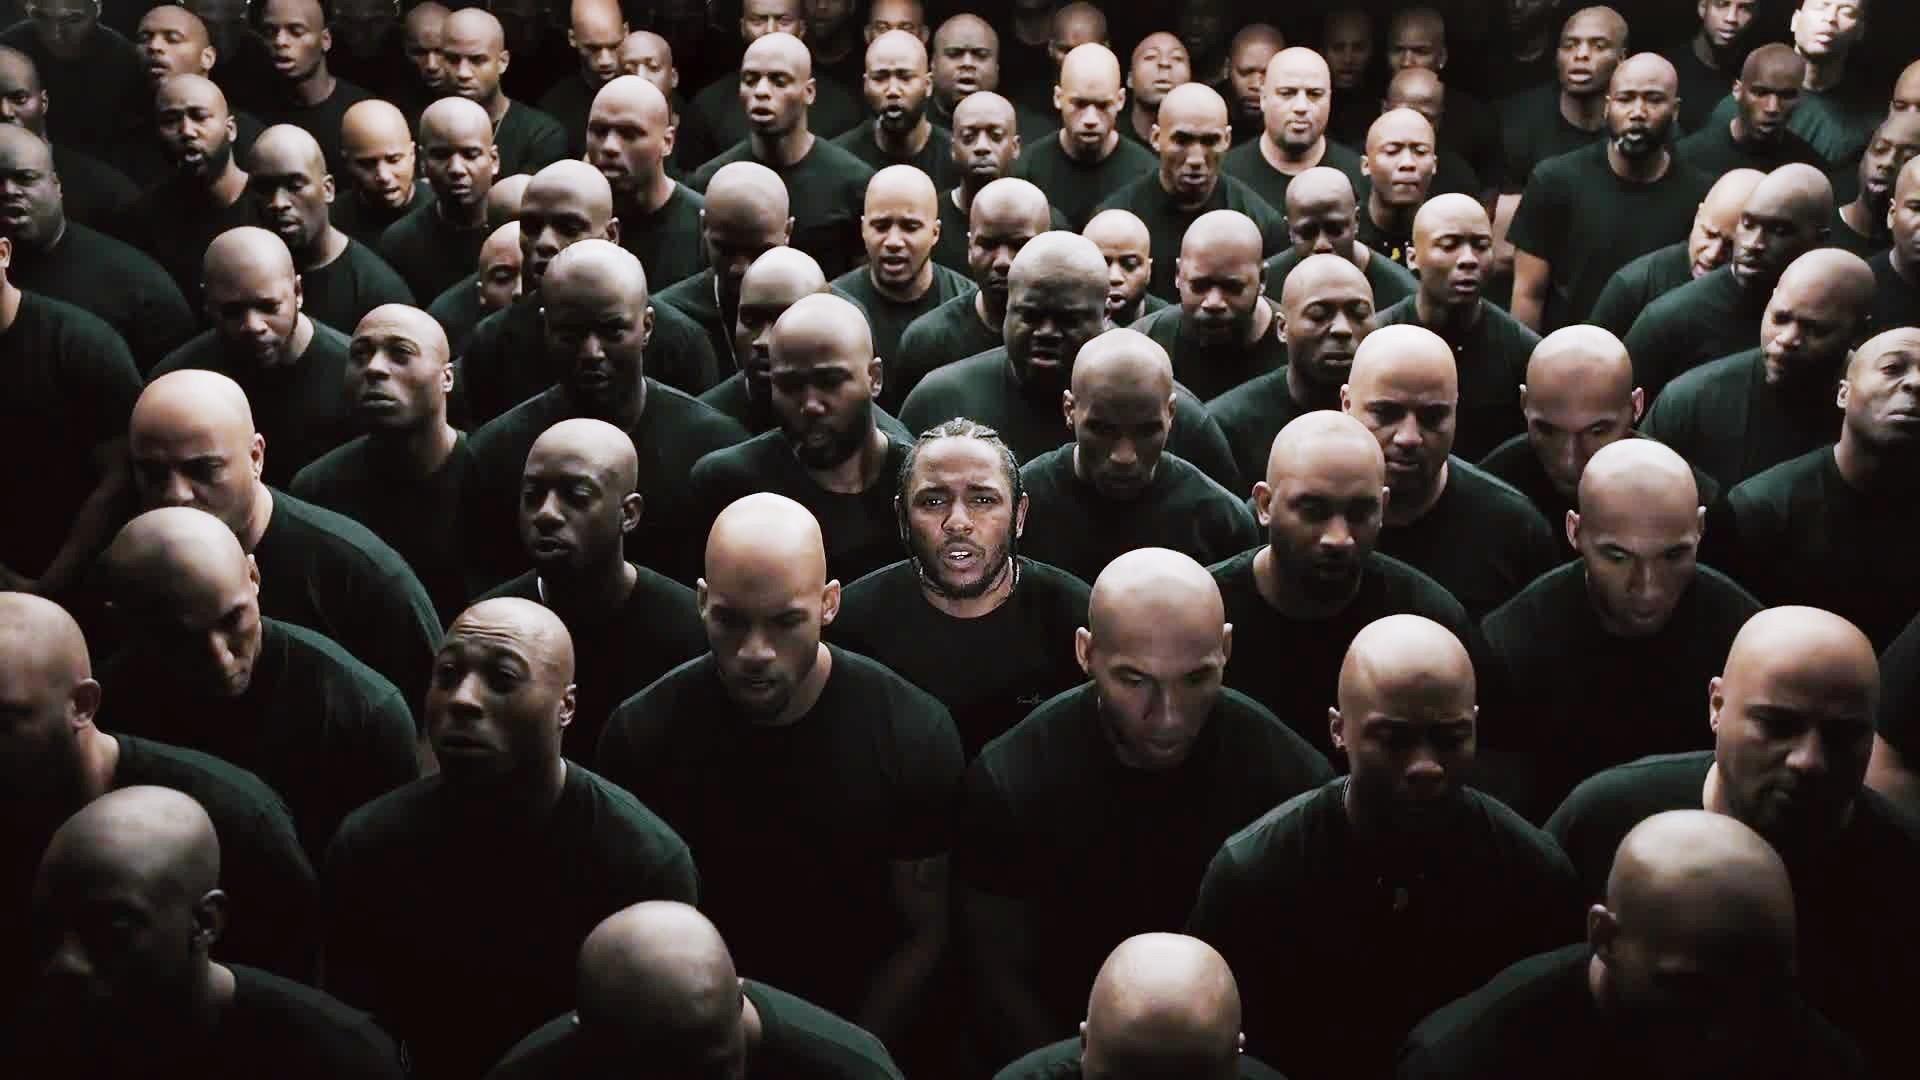 Kendrick Lamar wallpaper ·① Download free cool High ...